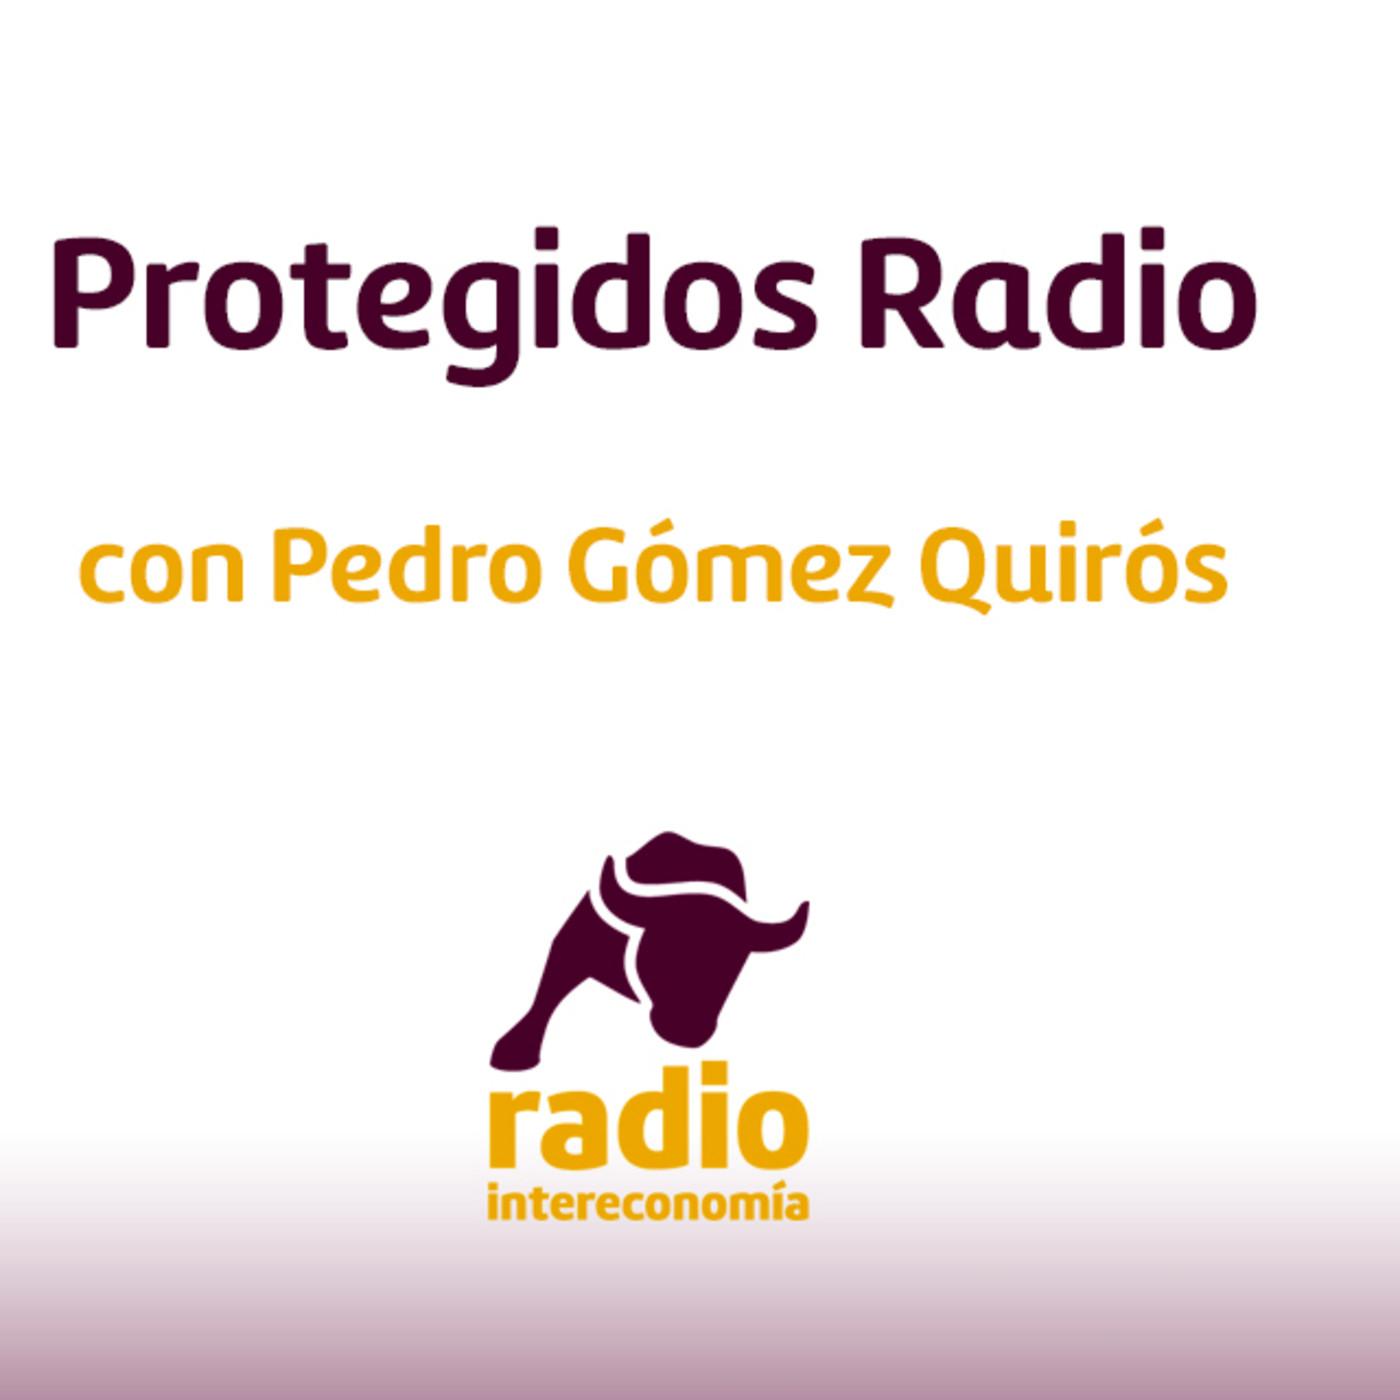 Protegidos radio 01/09/2020